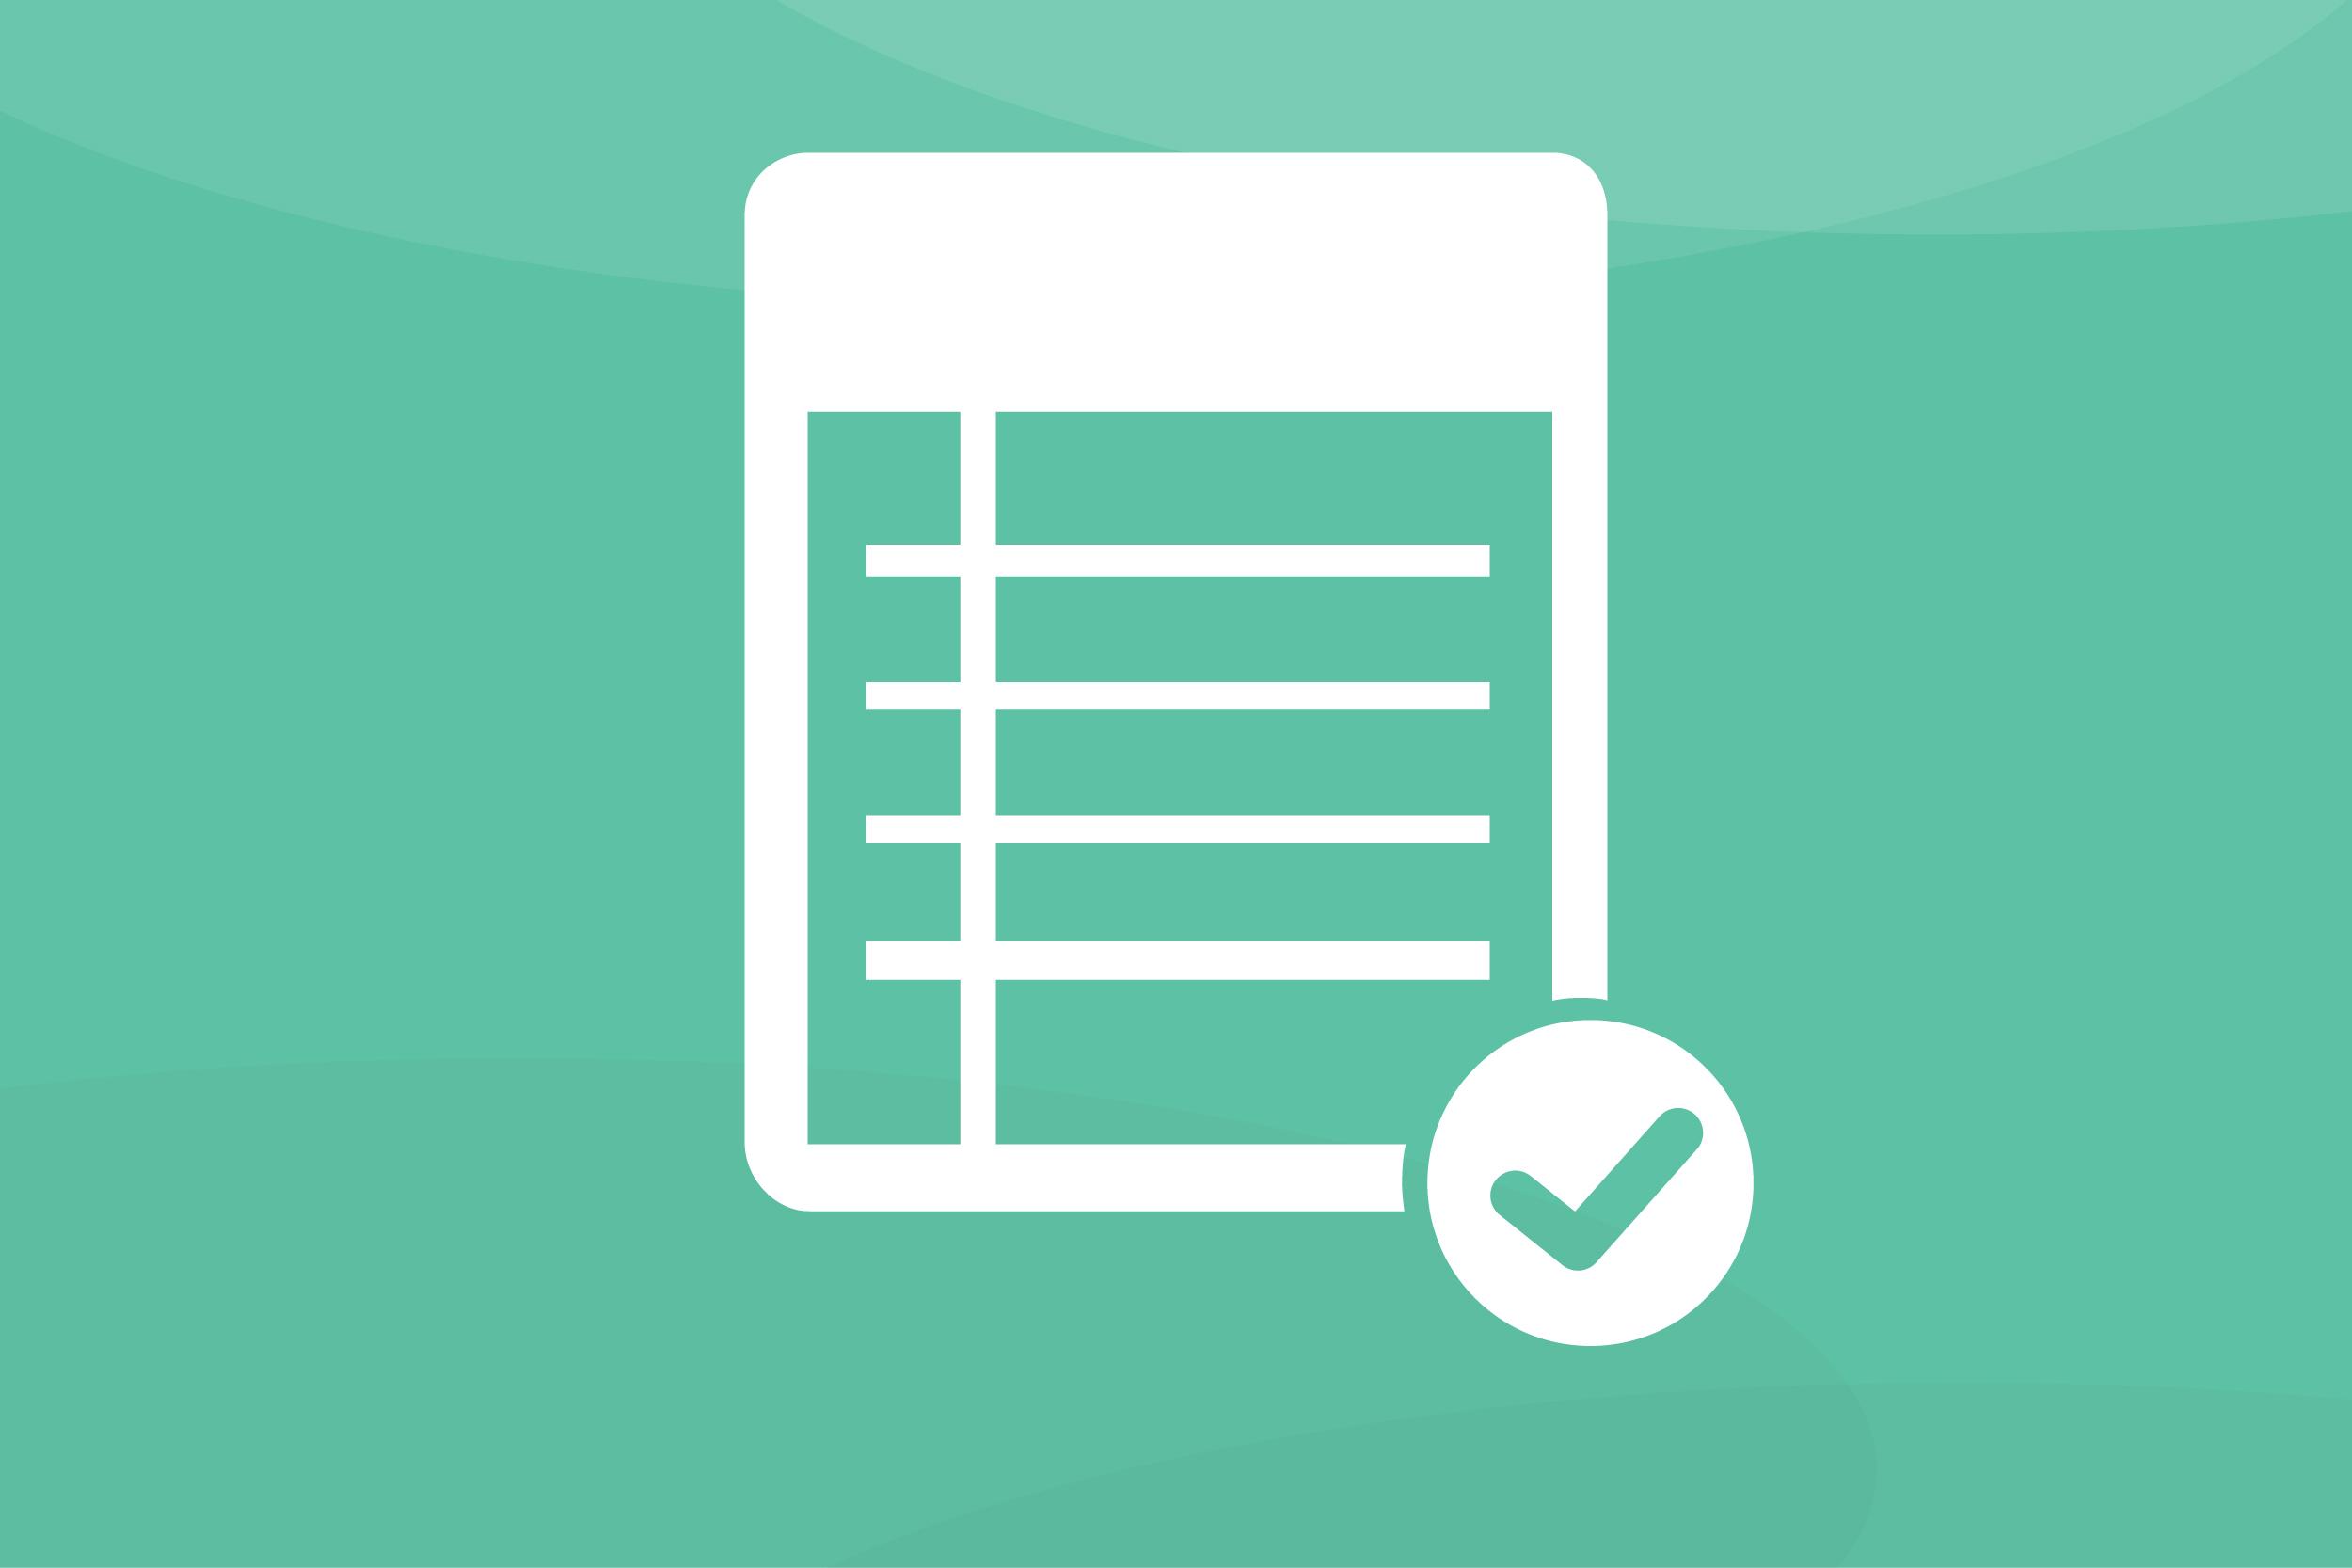 Form validations